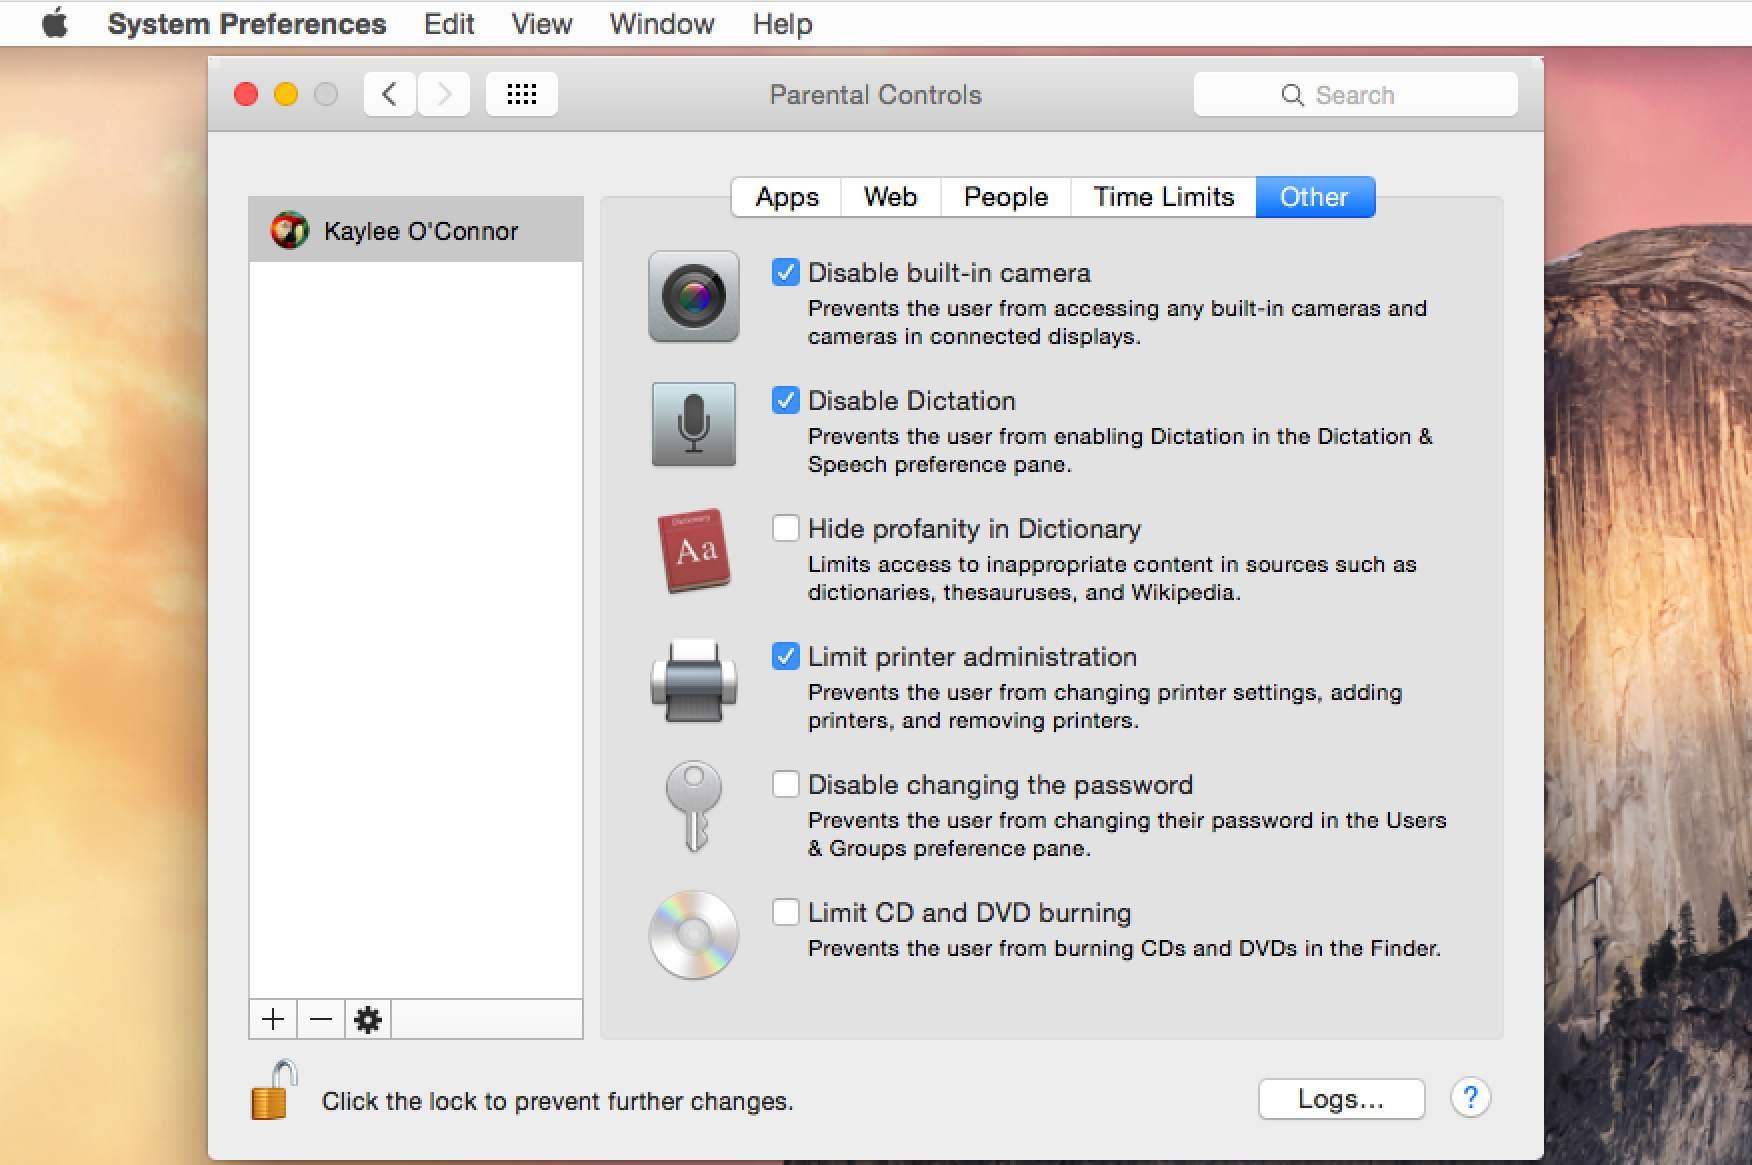 Set up the Mac's Parental Controls